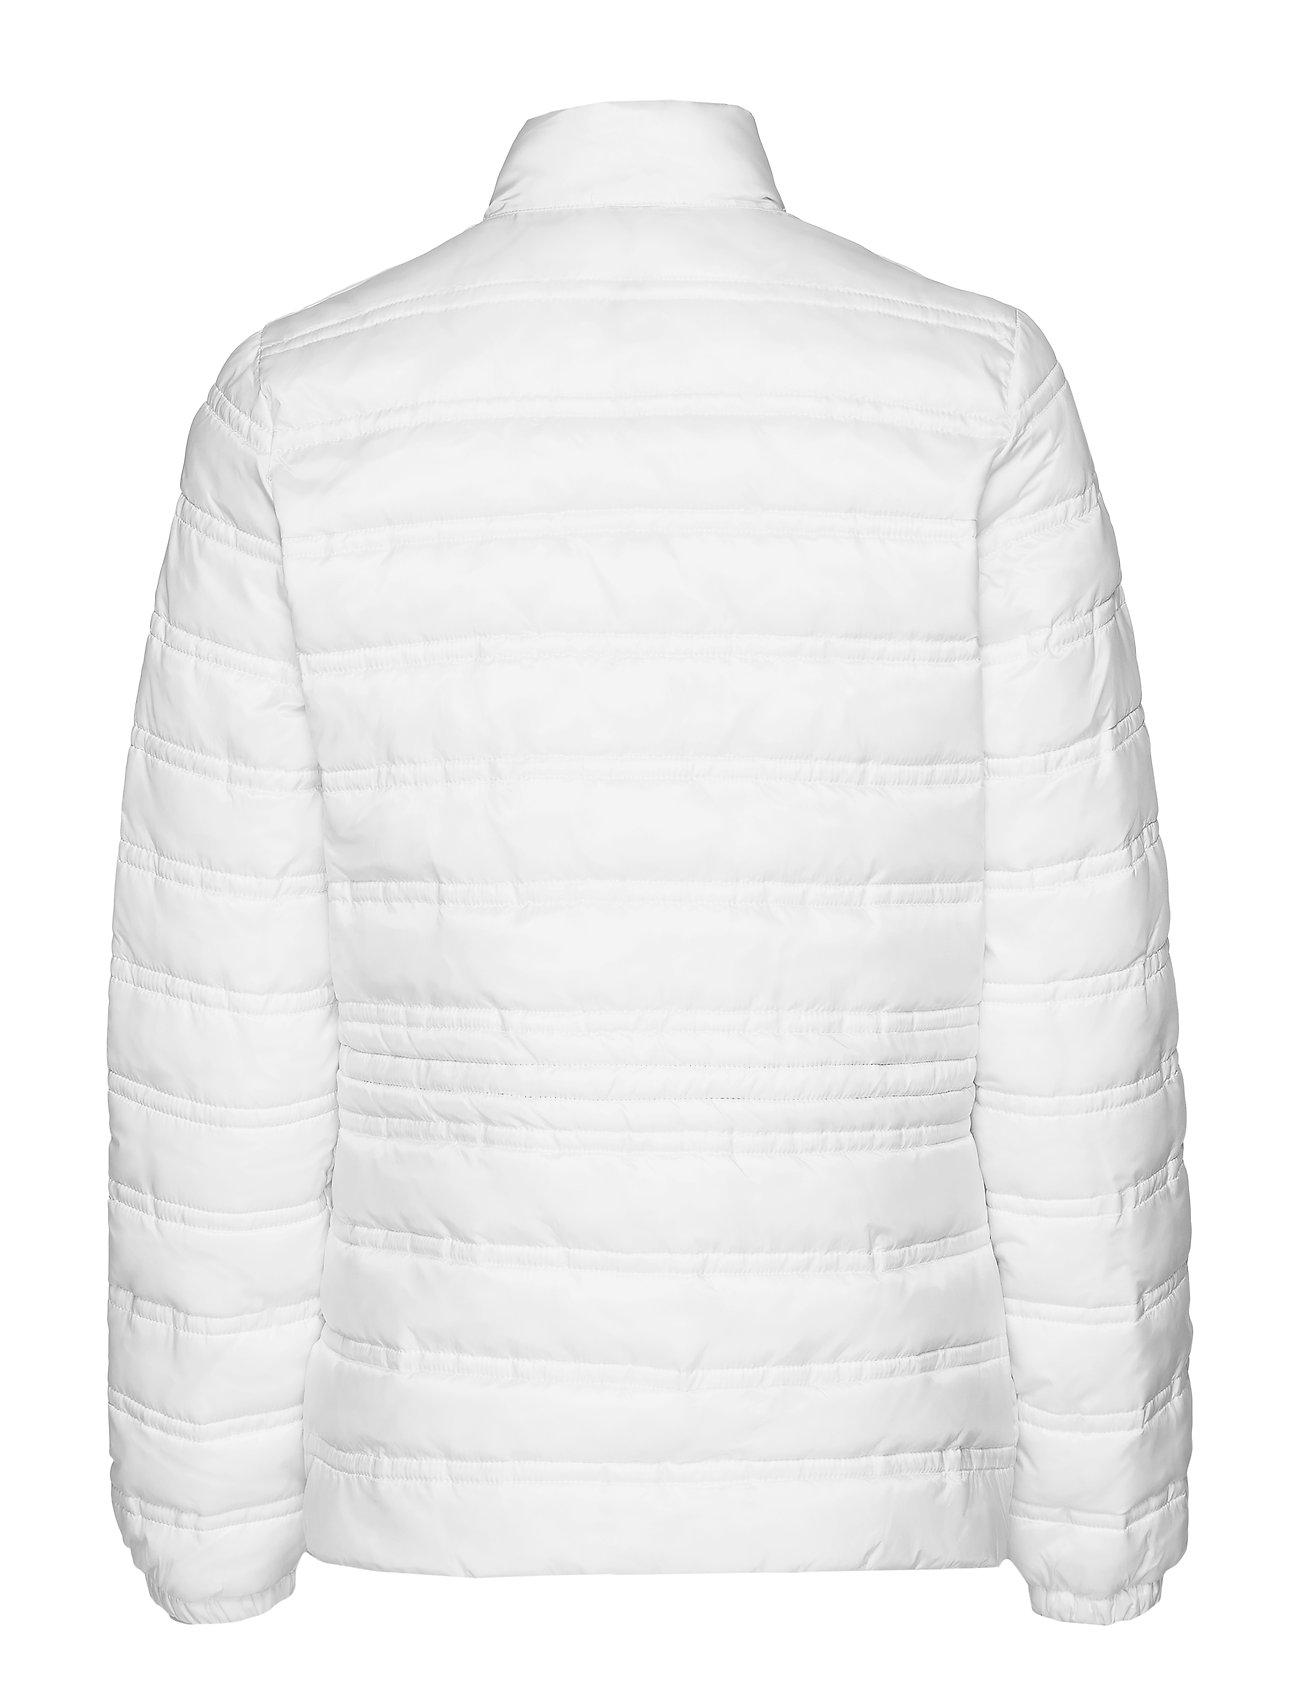 Jacketbutter Jacketbutter WhiteReplay WhiteReplay WhiteReplay WhiteReplay Jacketbutter Jacketbutter xerodCB